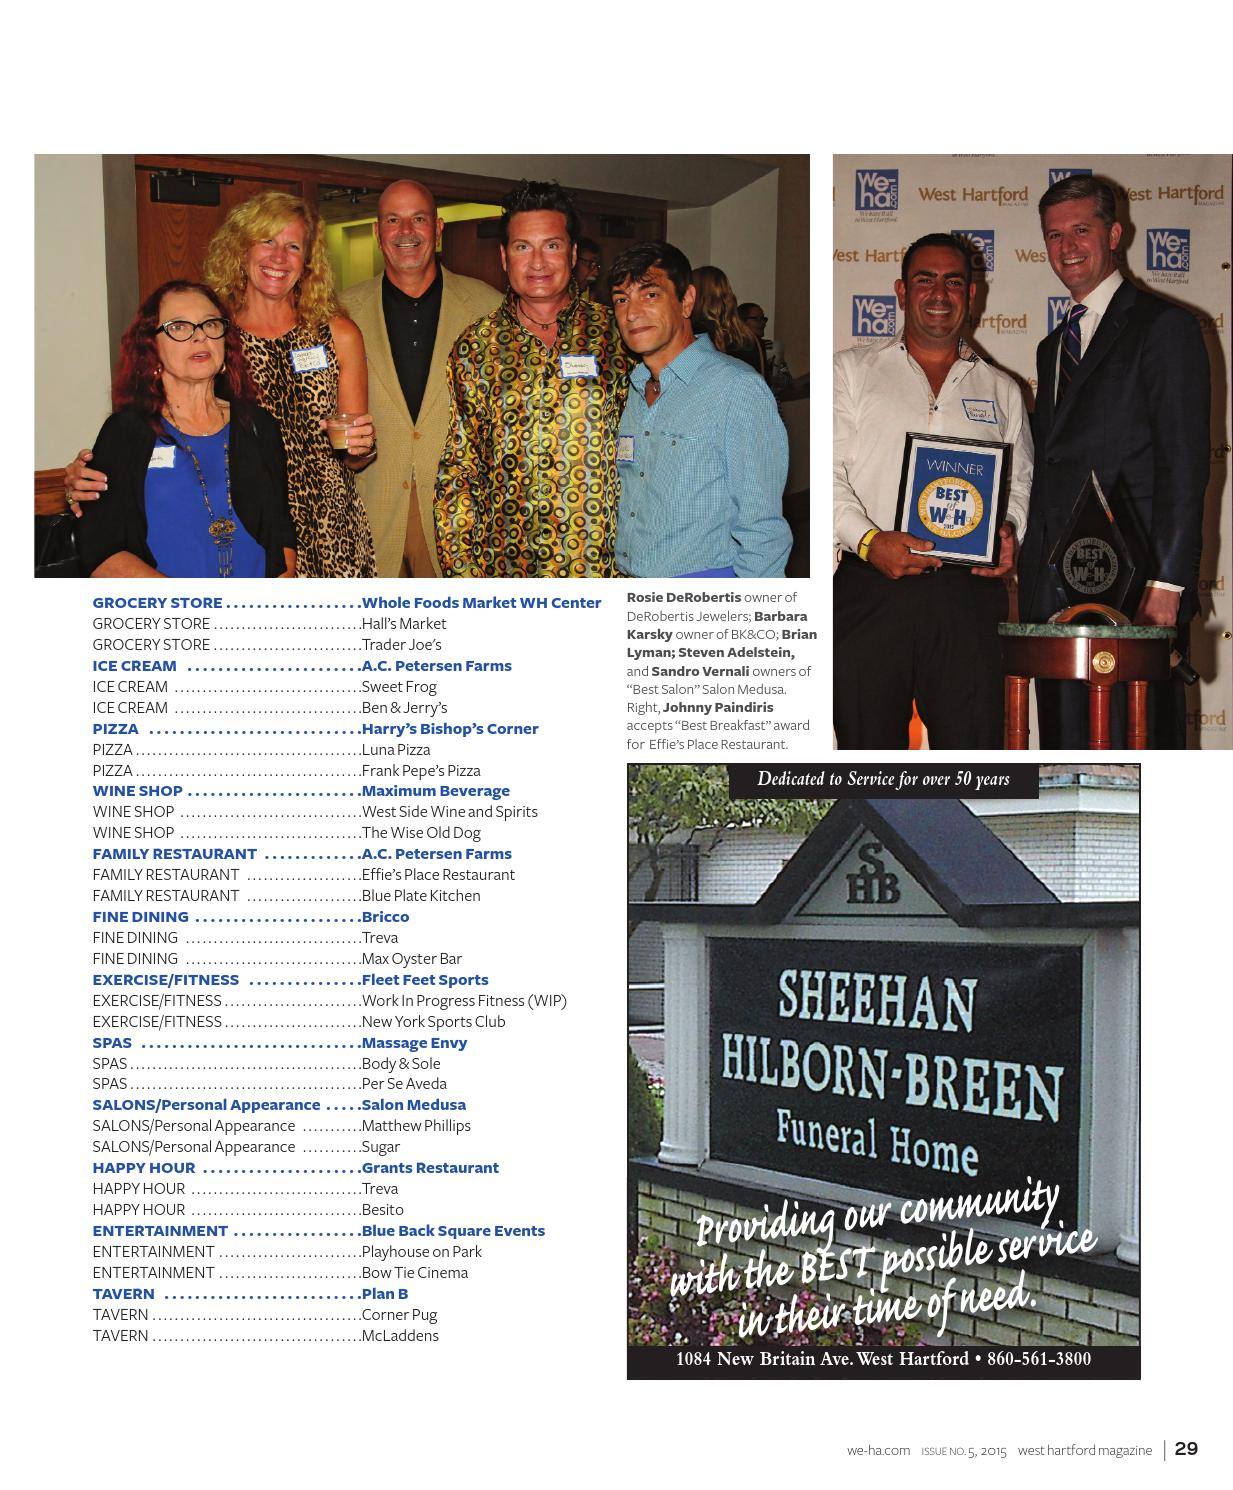 West Hartford Magazine Holiday 2015 by WHMedia, Inc. - issuu